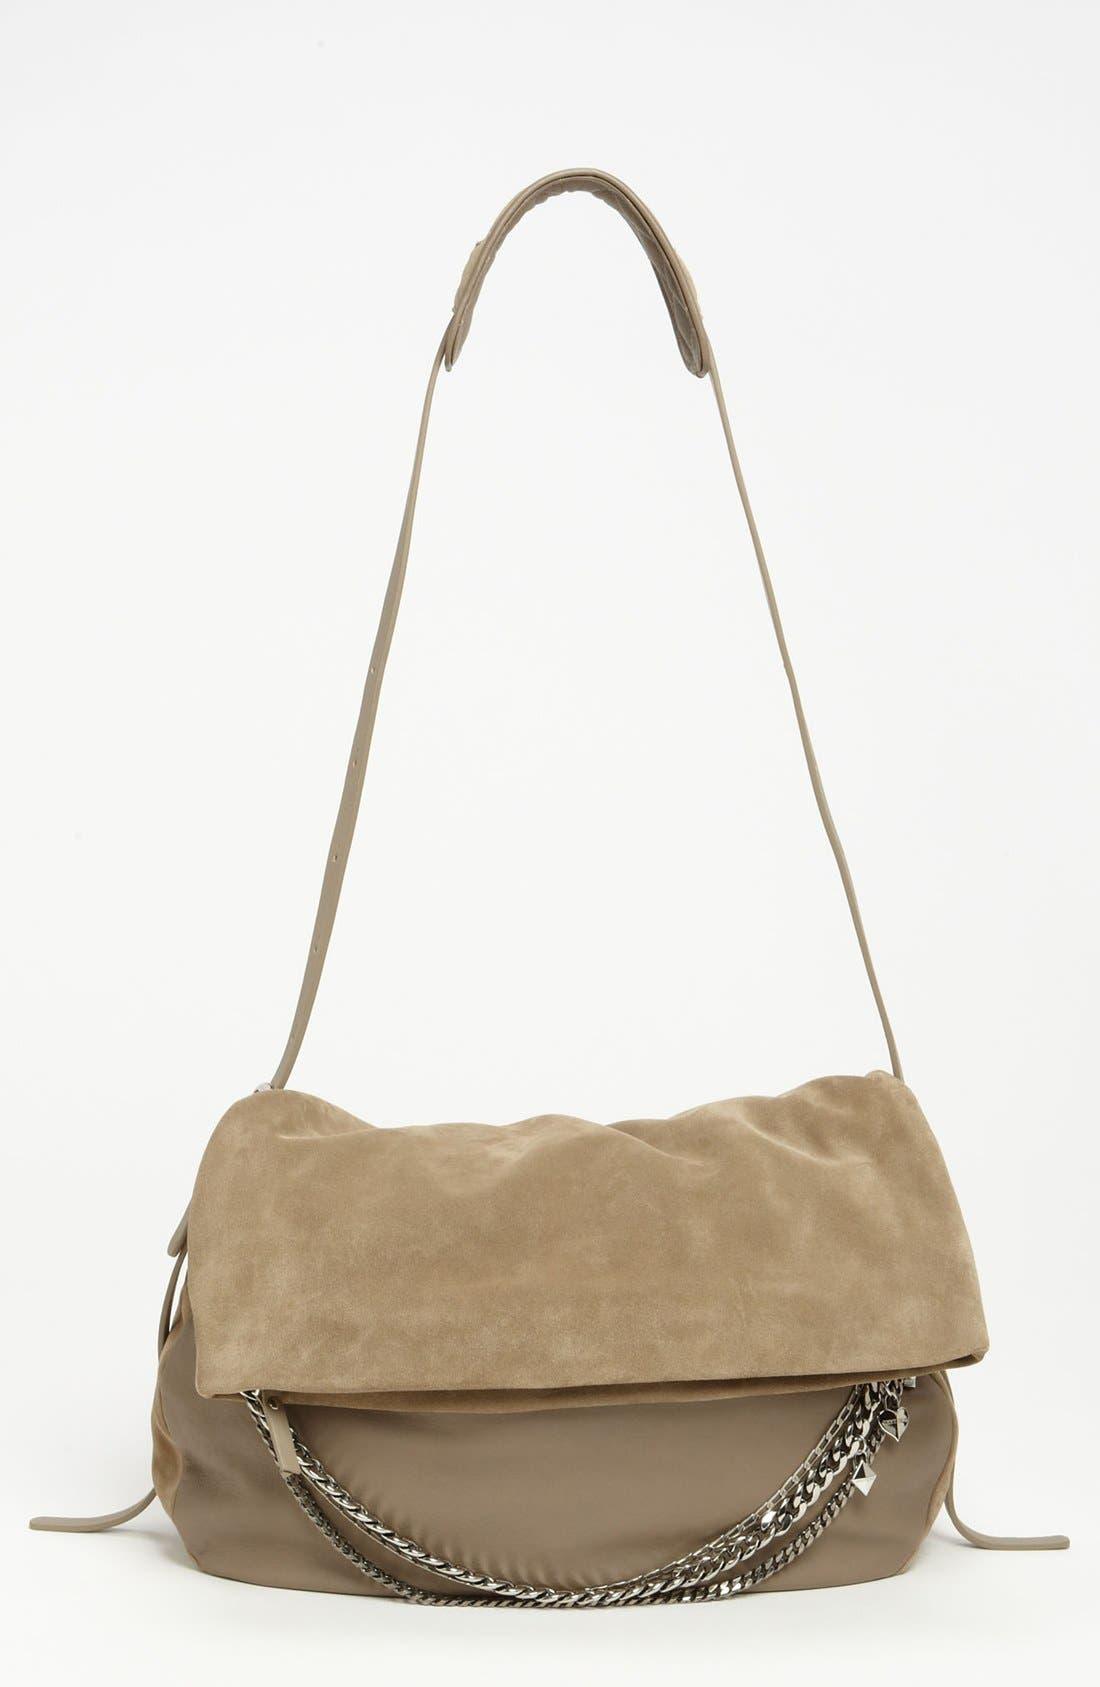 Alternate Image 1 Selected - Jimmy Choo 'Biker - Large' Suede & Leather Crossbody Bag